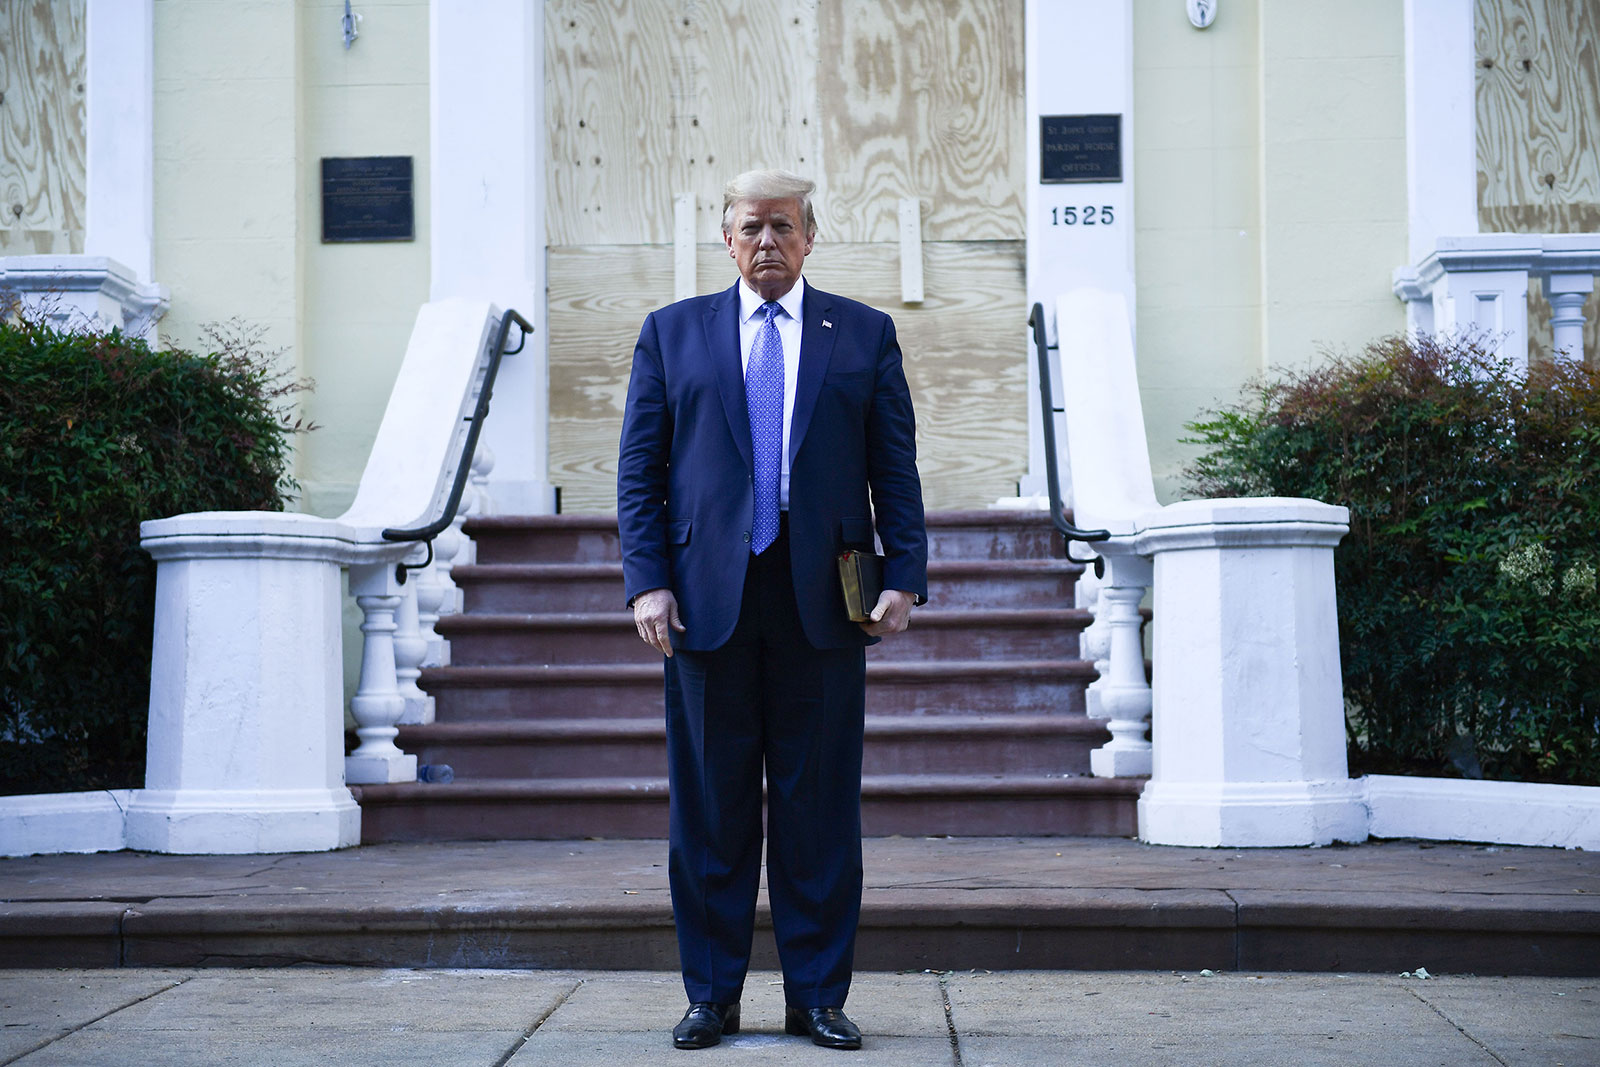 Federal probe: Protest not broken up due to Trump photo op - WISH-TV